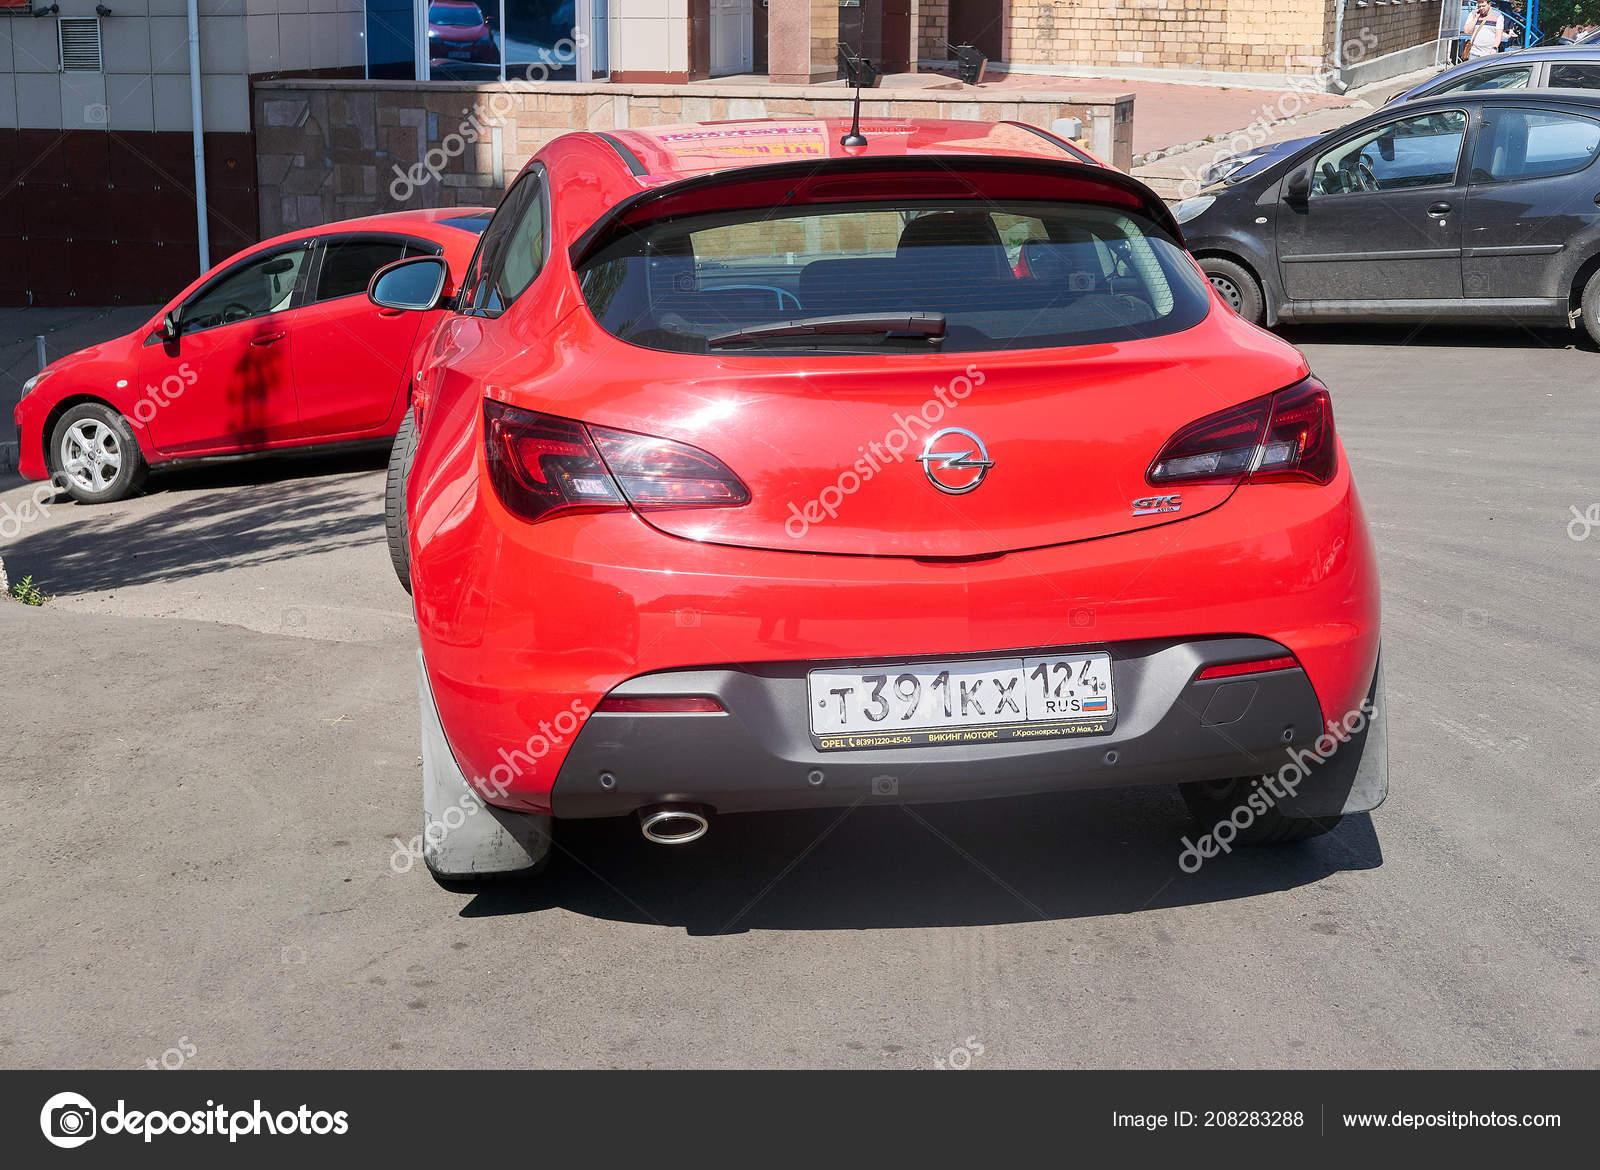 krasnojarsk russland august 2018 opel astra gtc rot sportwagen ist